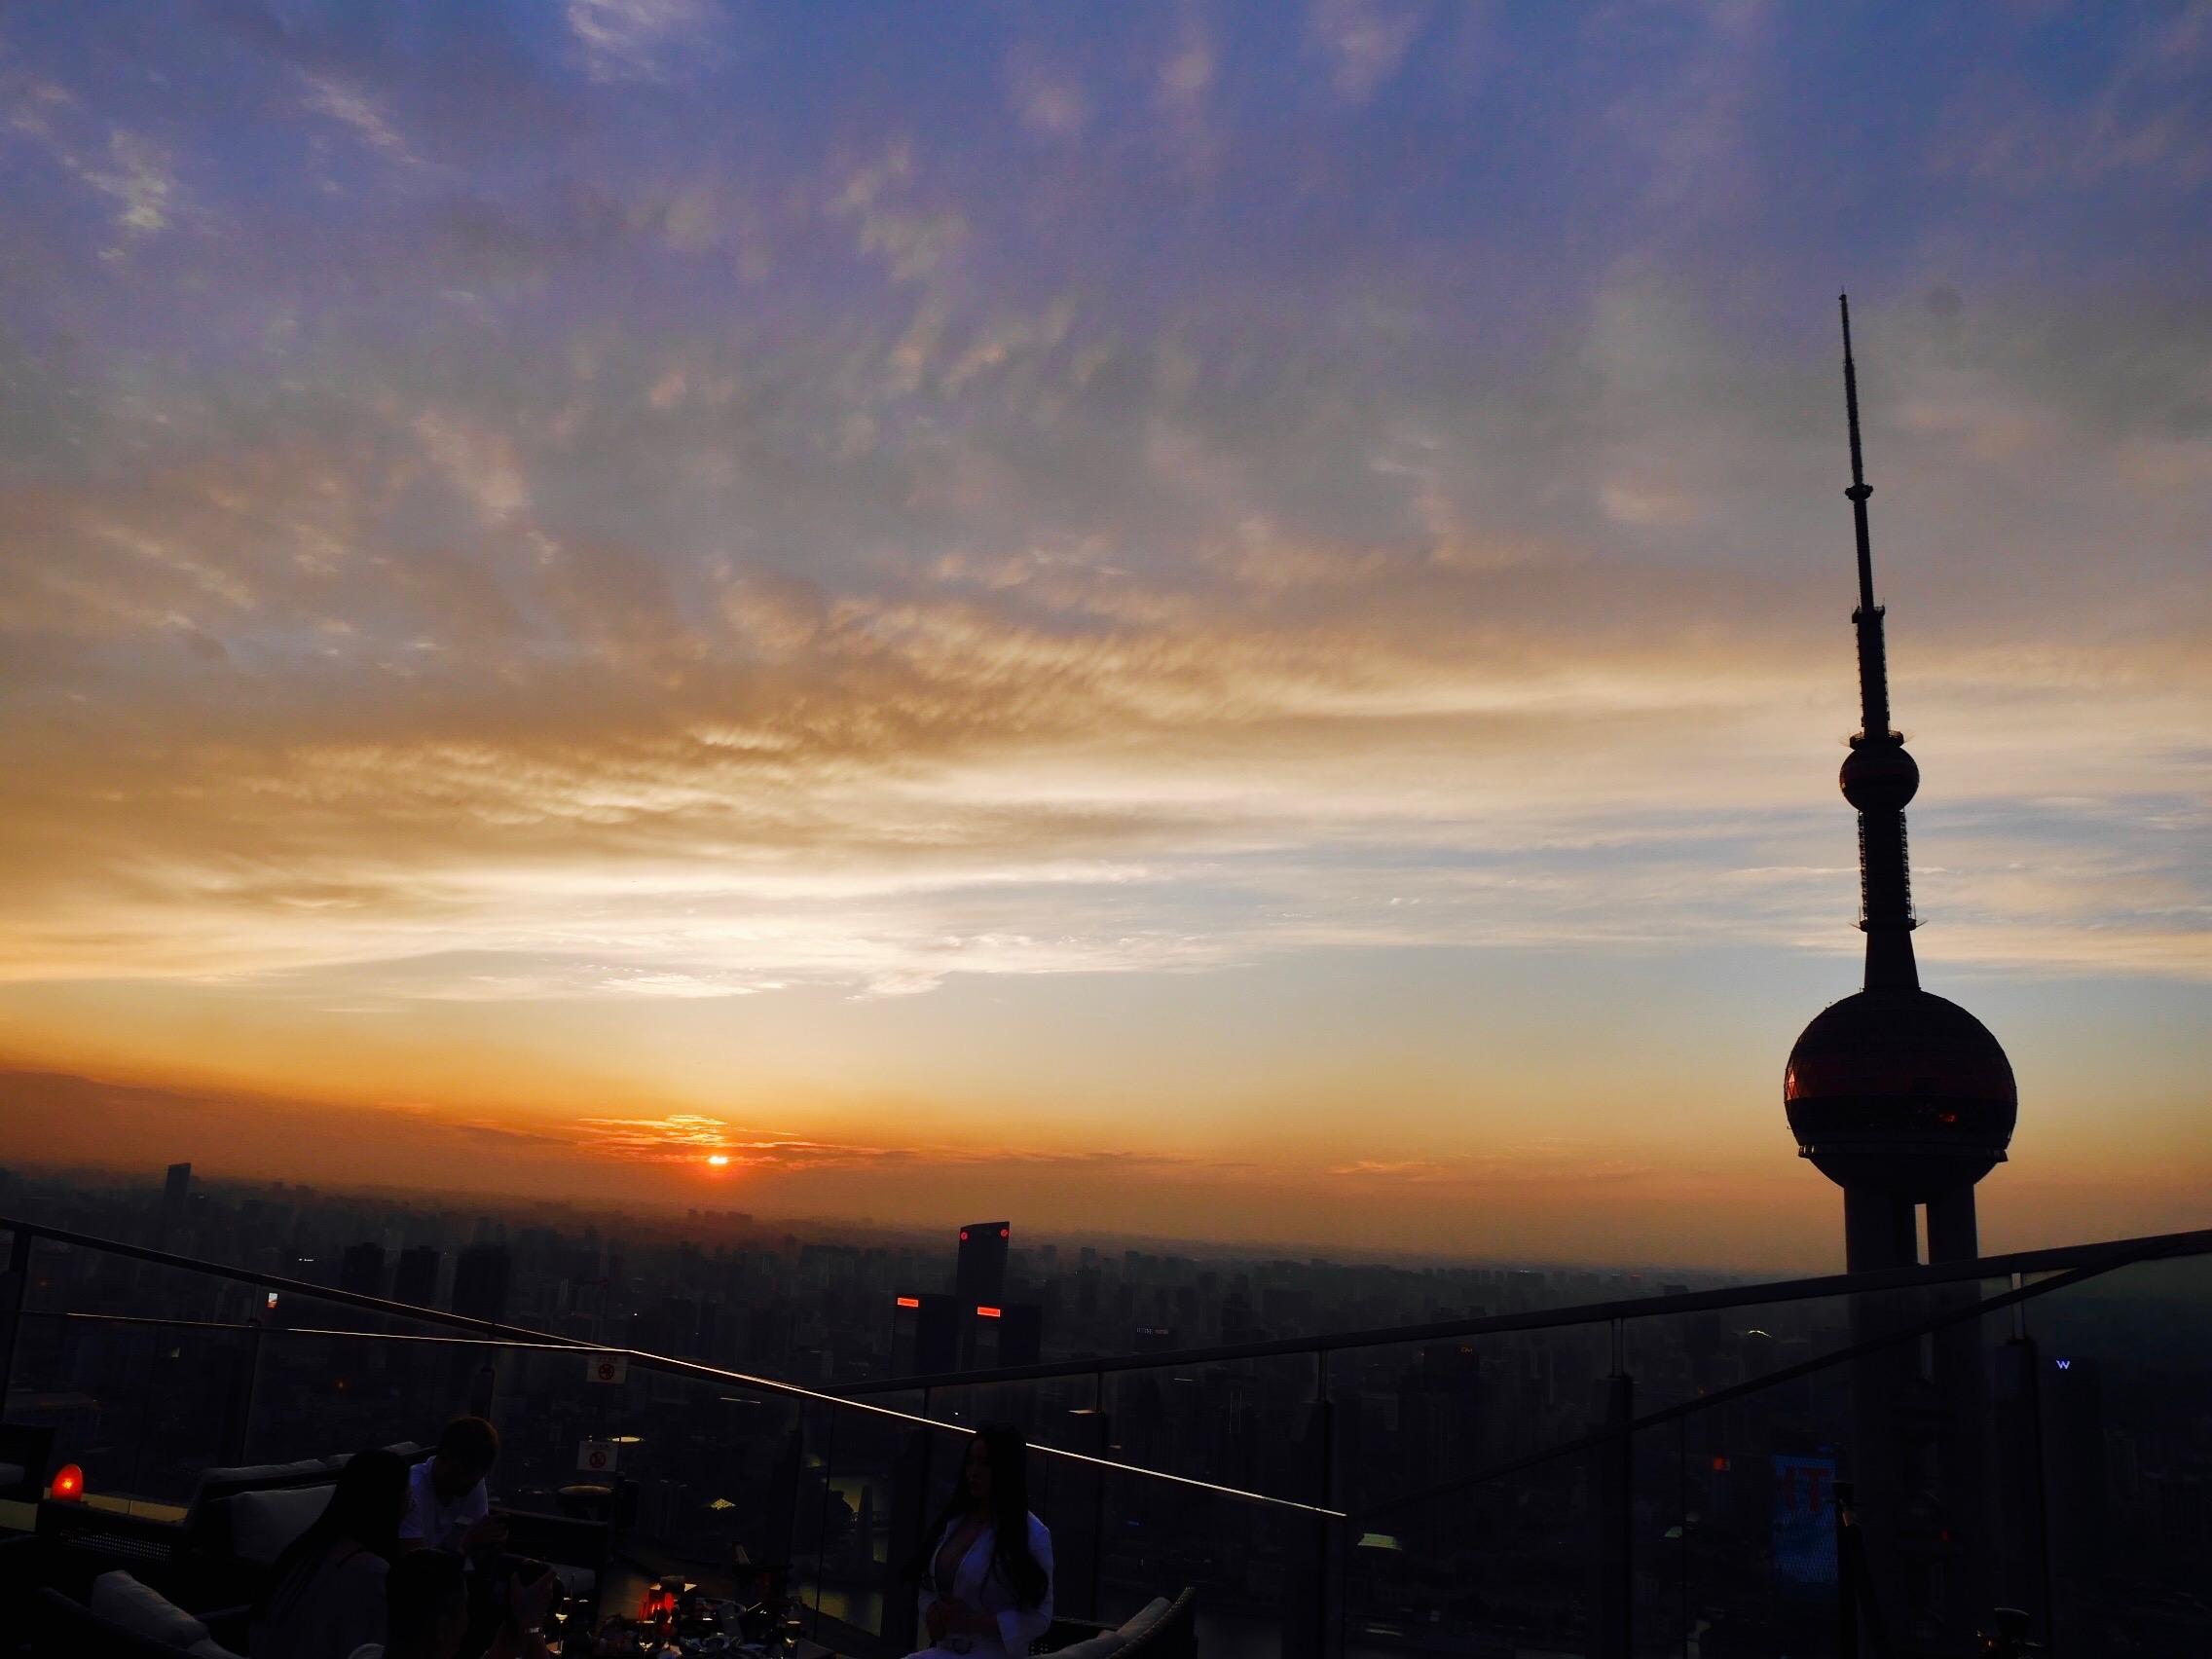 85DBB173 E0C6 441C AB24 436A6C0AE5ED - Flair Rooftop - 外灘の夜景を見下ろす上海リッツカールトンルーフトップバー